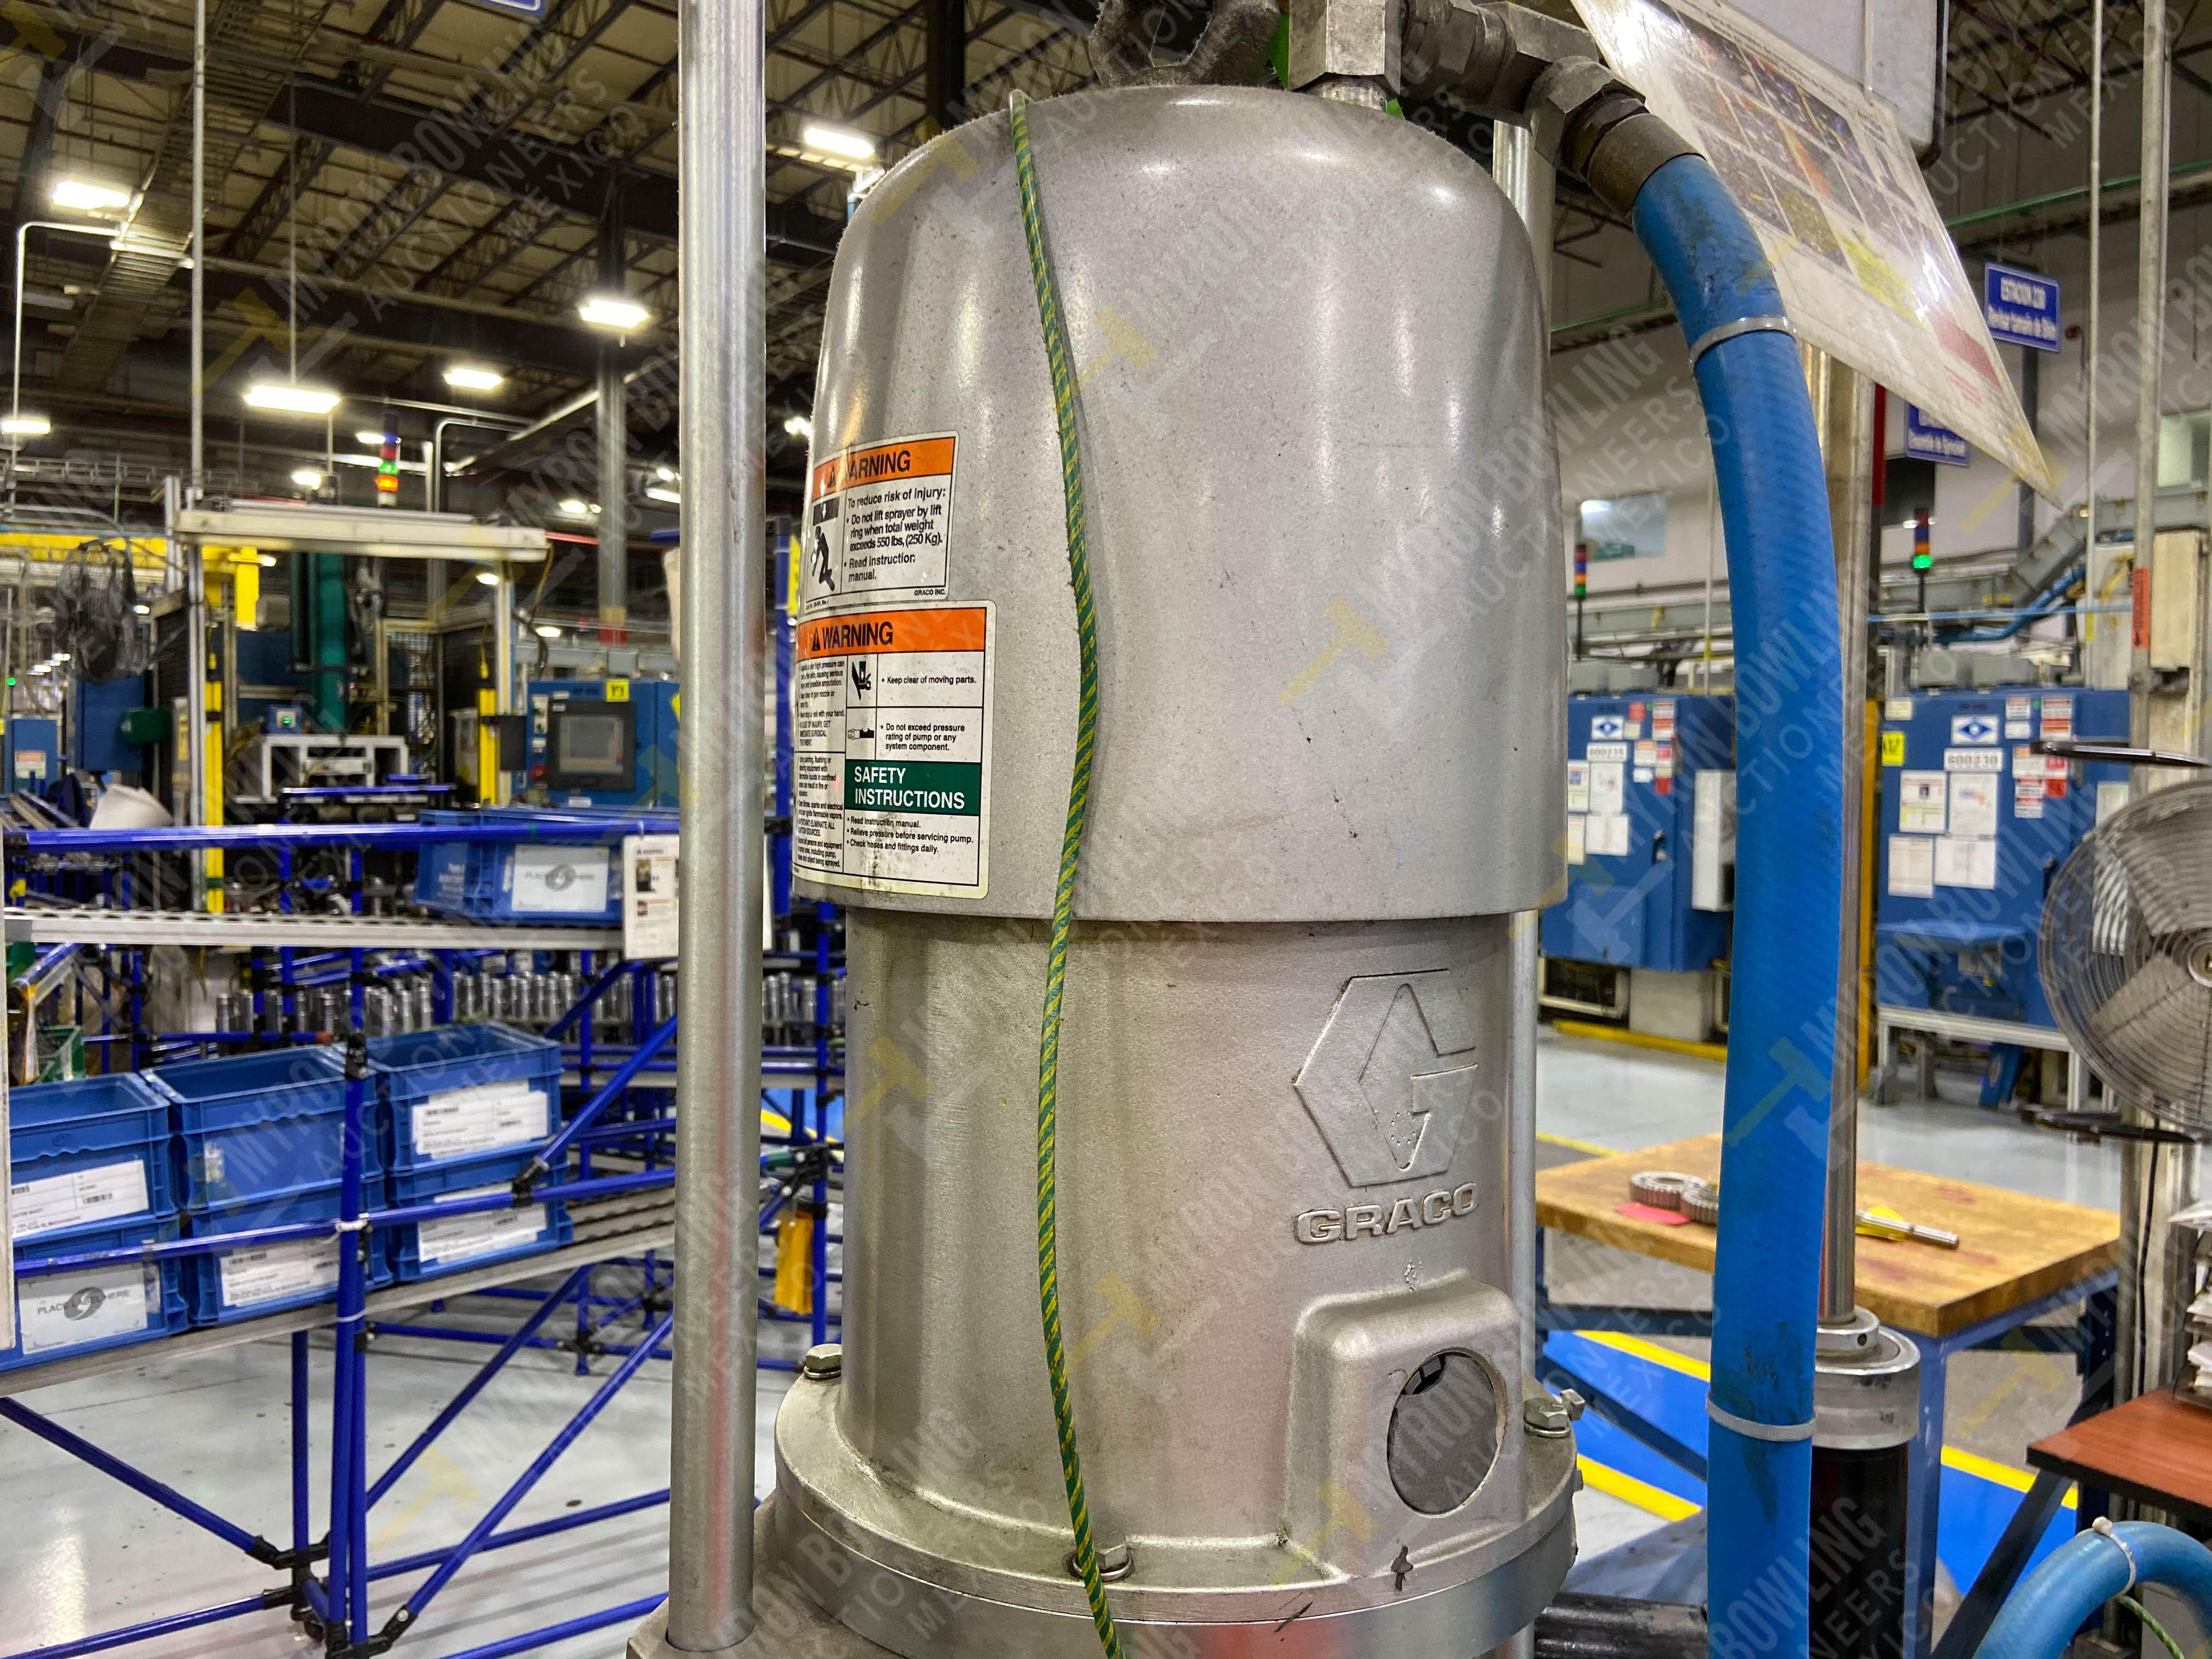 Dos sistemas de dispensador de sellador RTV (bombas) marca Graco Bulldog, 8.3 L/min max - Image 8 of 12